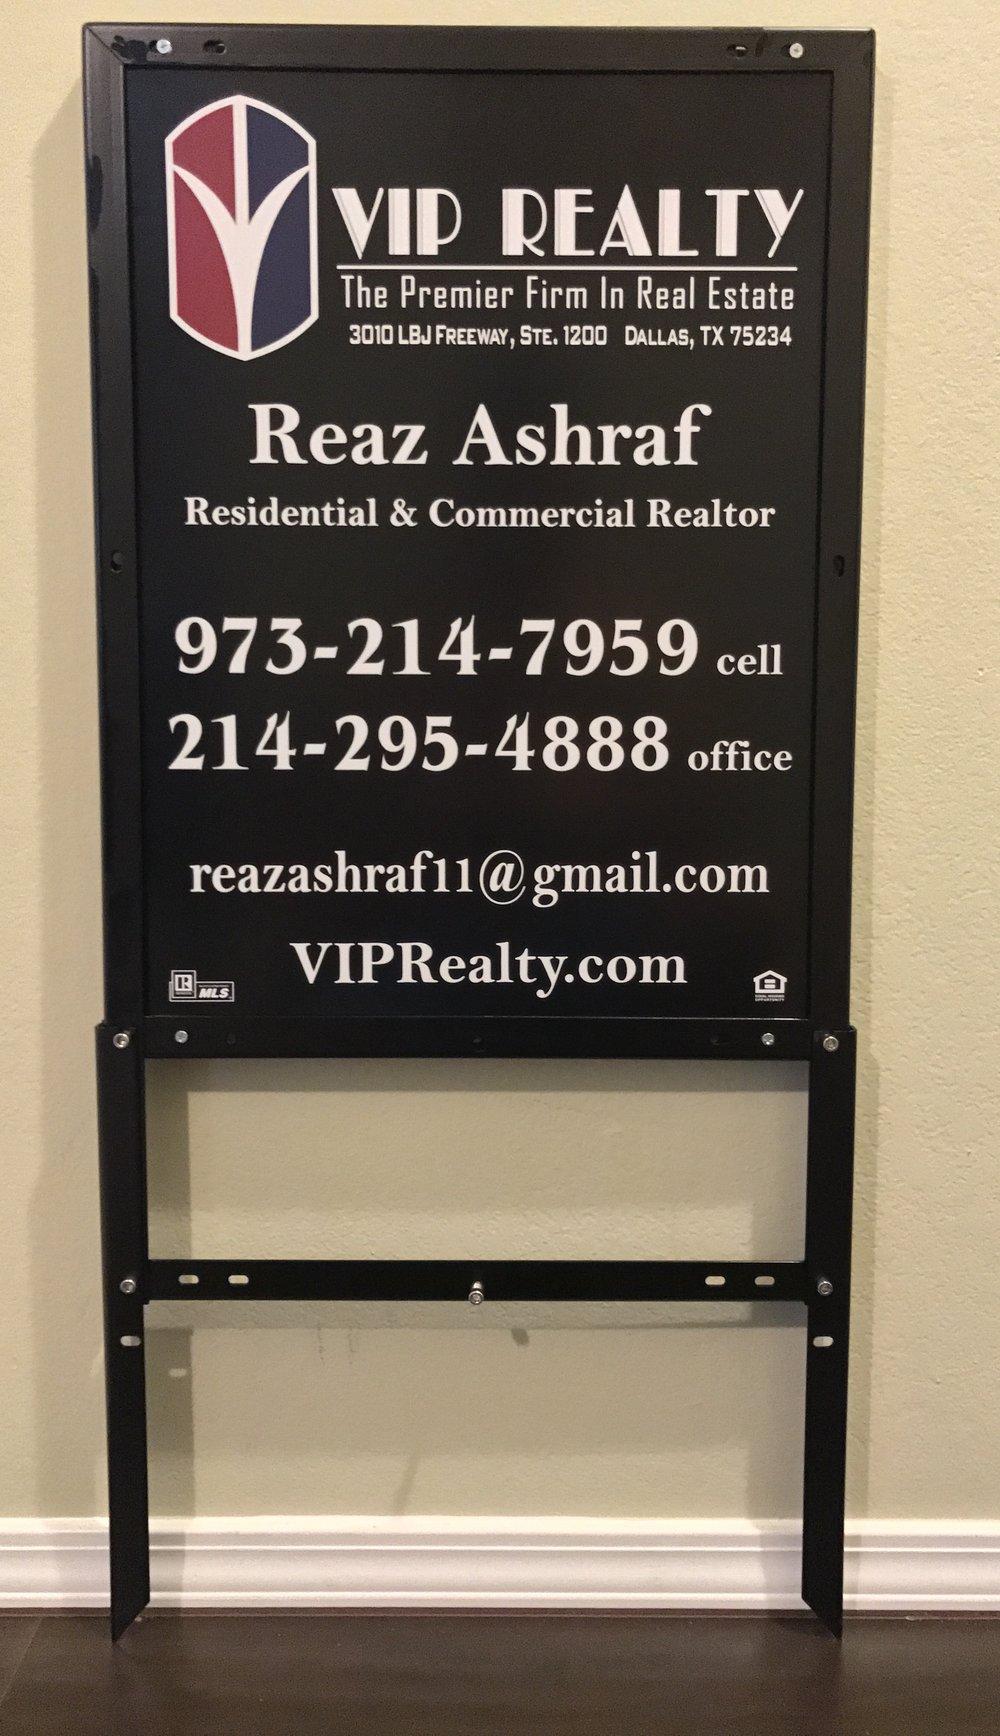 VIP Realty Reaz Ashraf Vertical.jpg